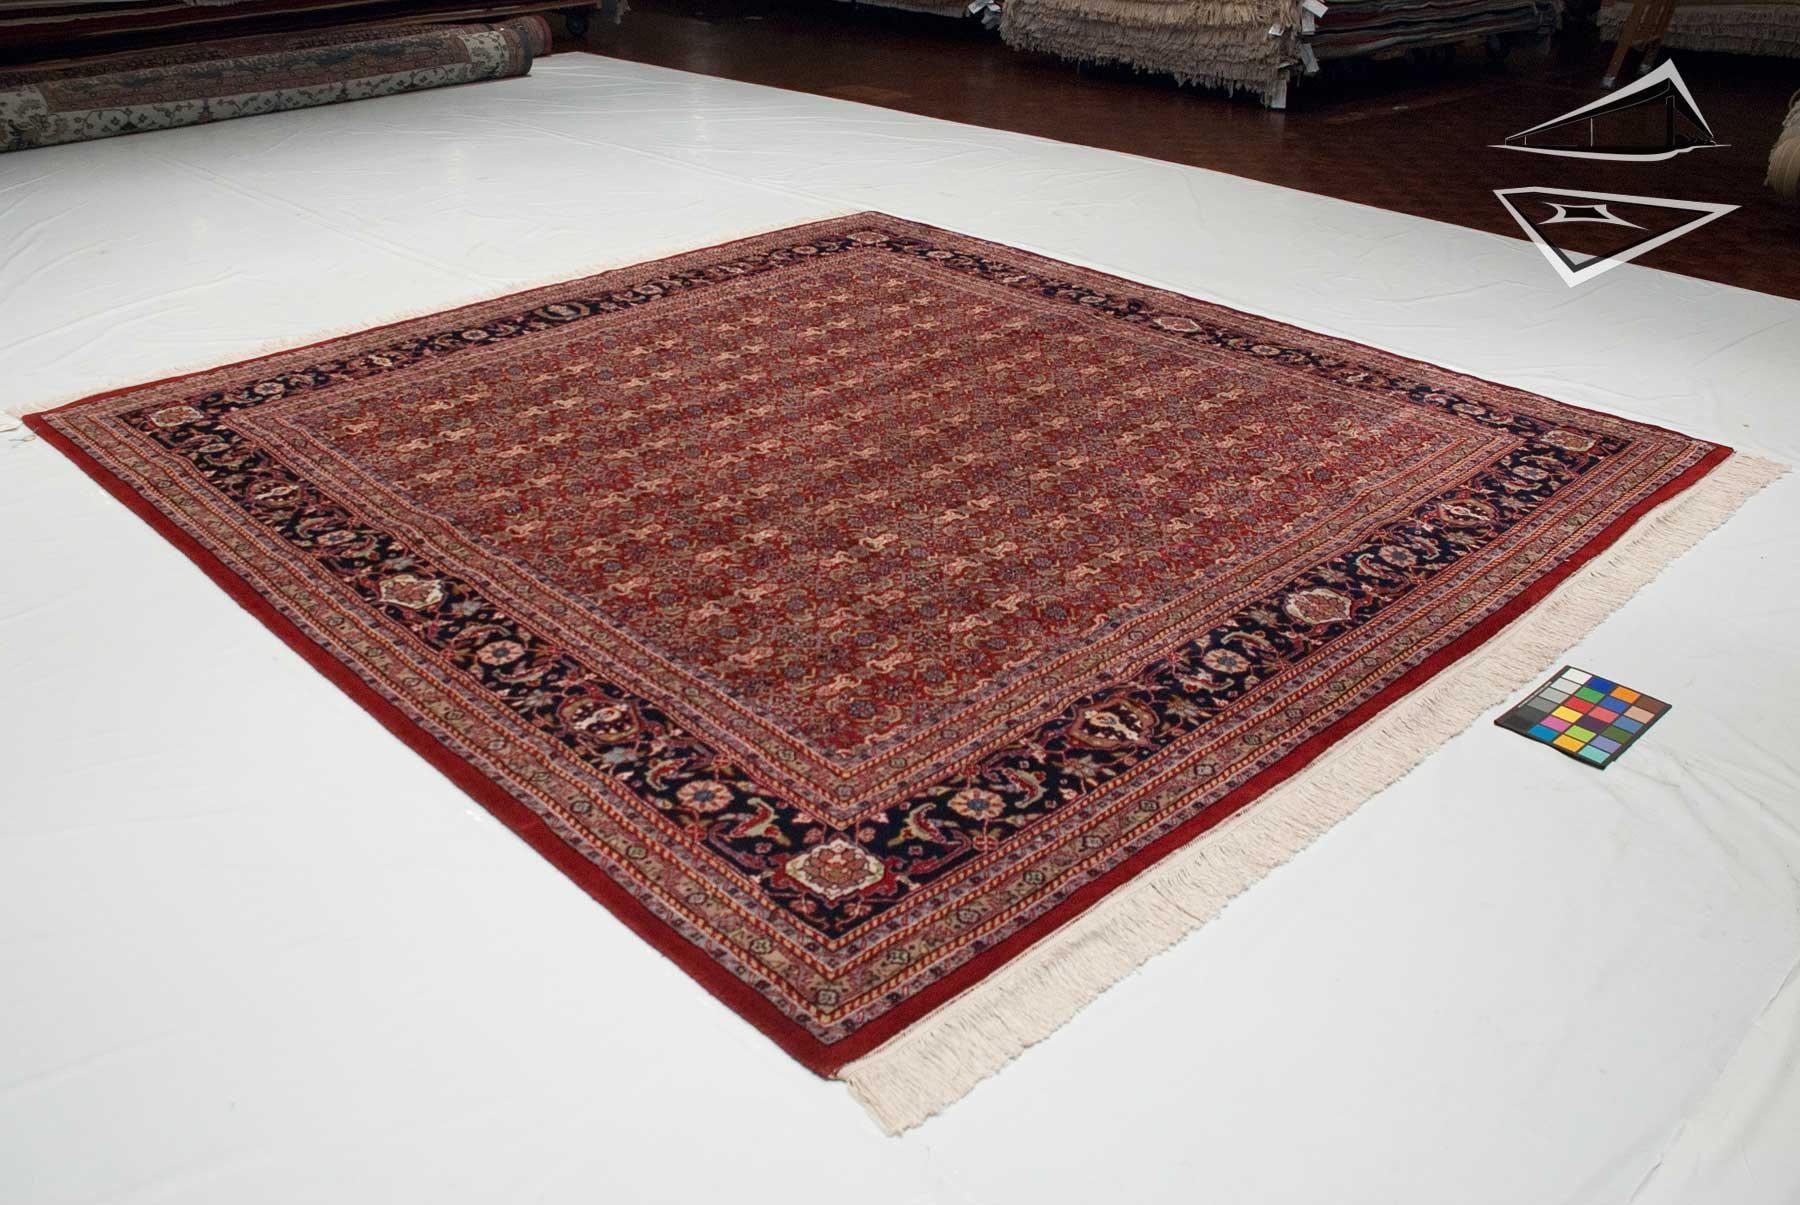 herati tabriz design square rug 10 39 x 10 39. Black Bedroom Furniture Sets. Home Design Ideas